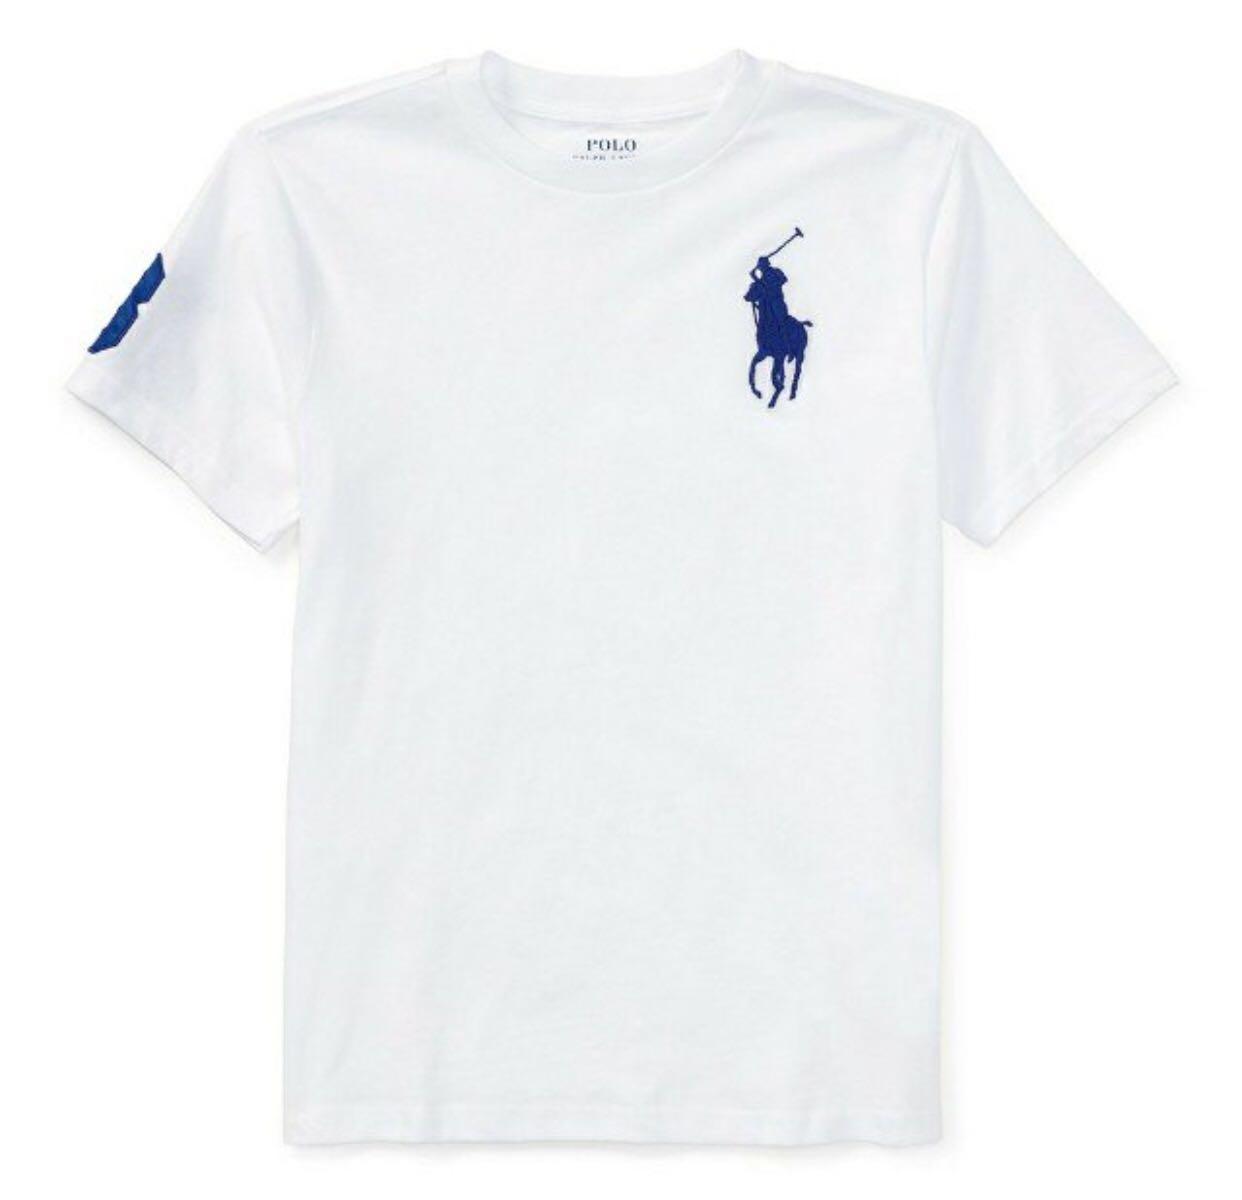 Ralph Lauren rl 大馬素T 青年版 L 白色藍馬polo